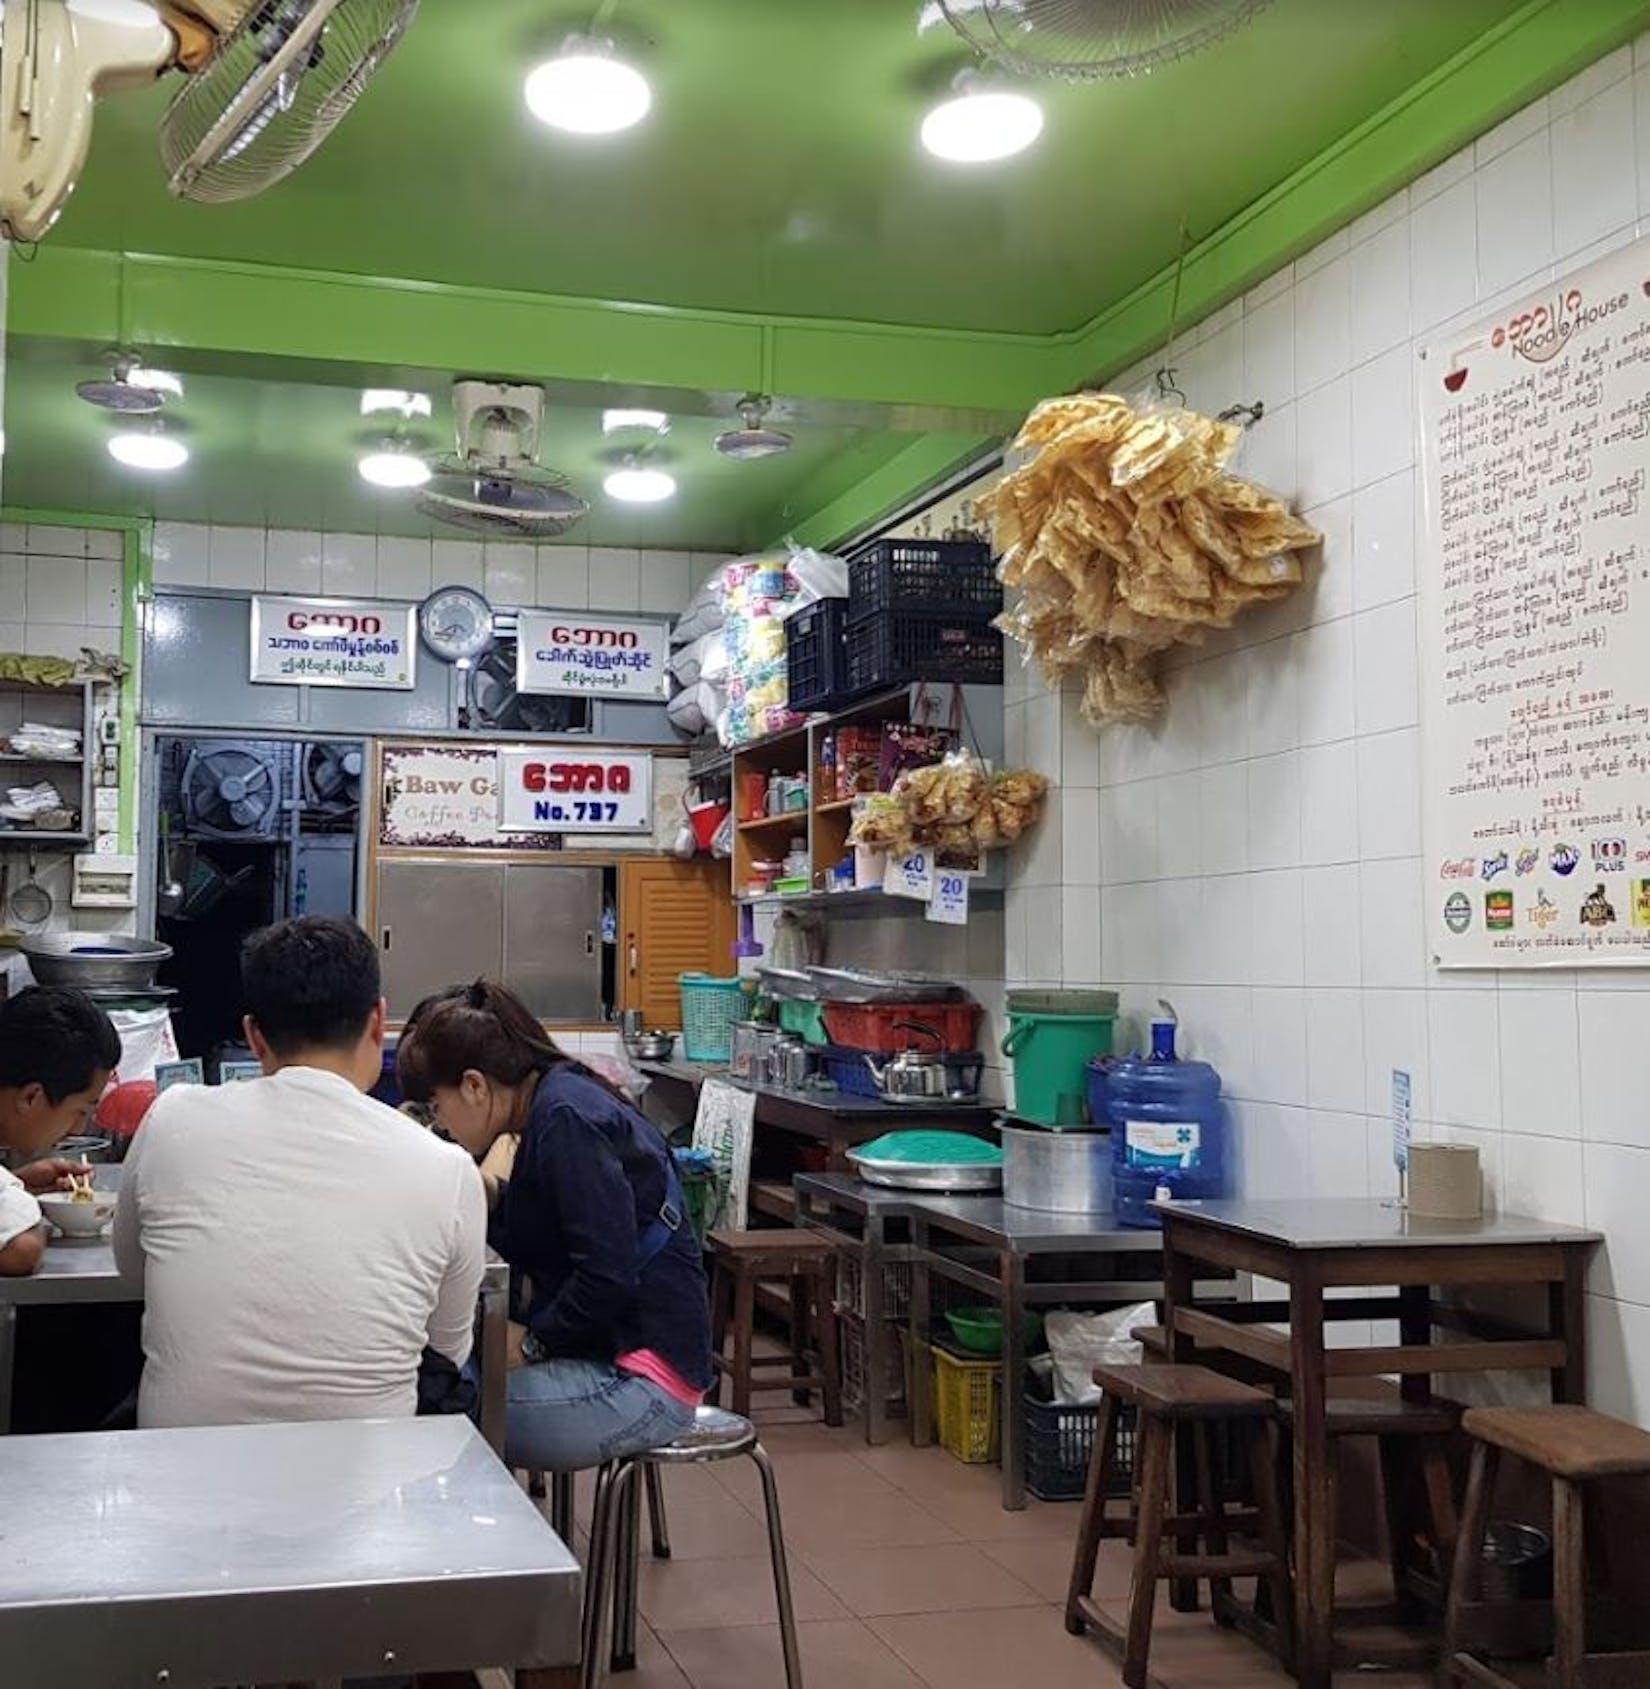 Baw Ga Noodle House | yathar